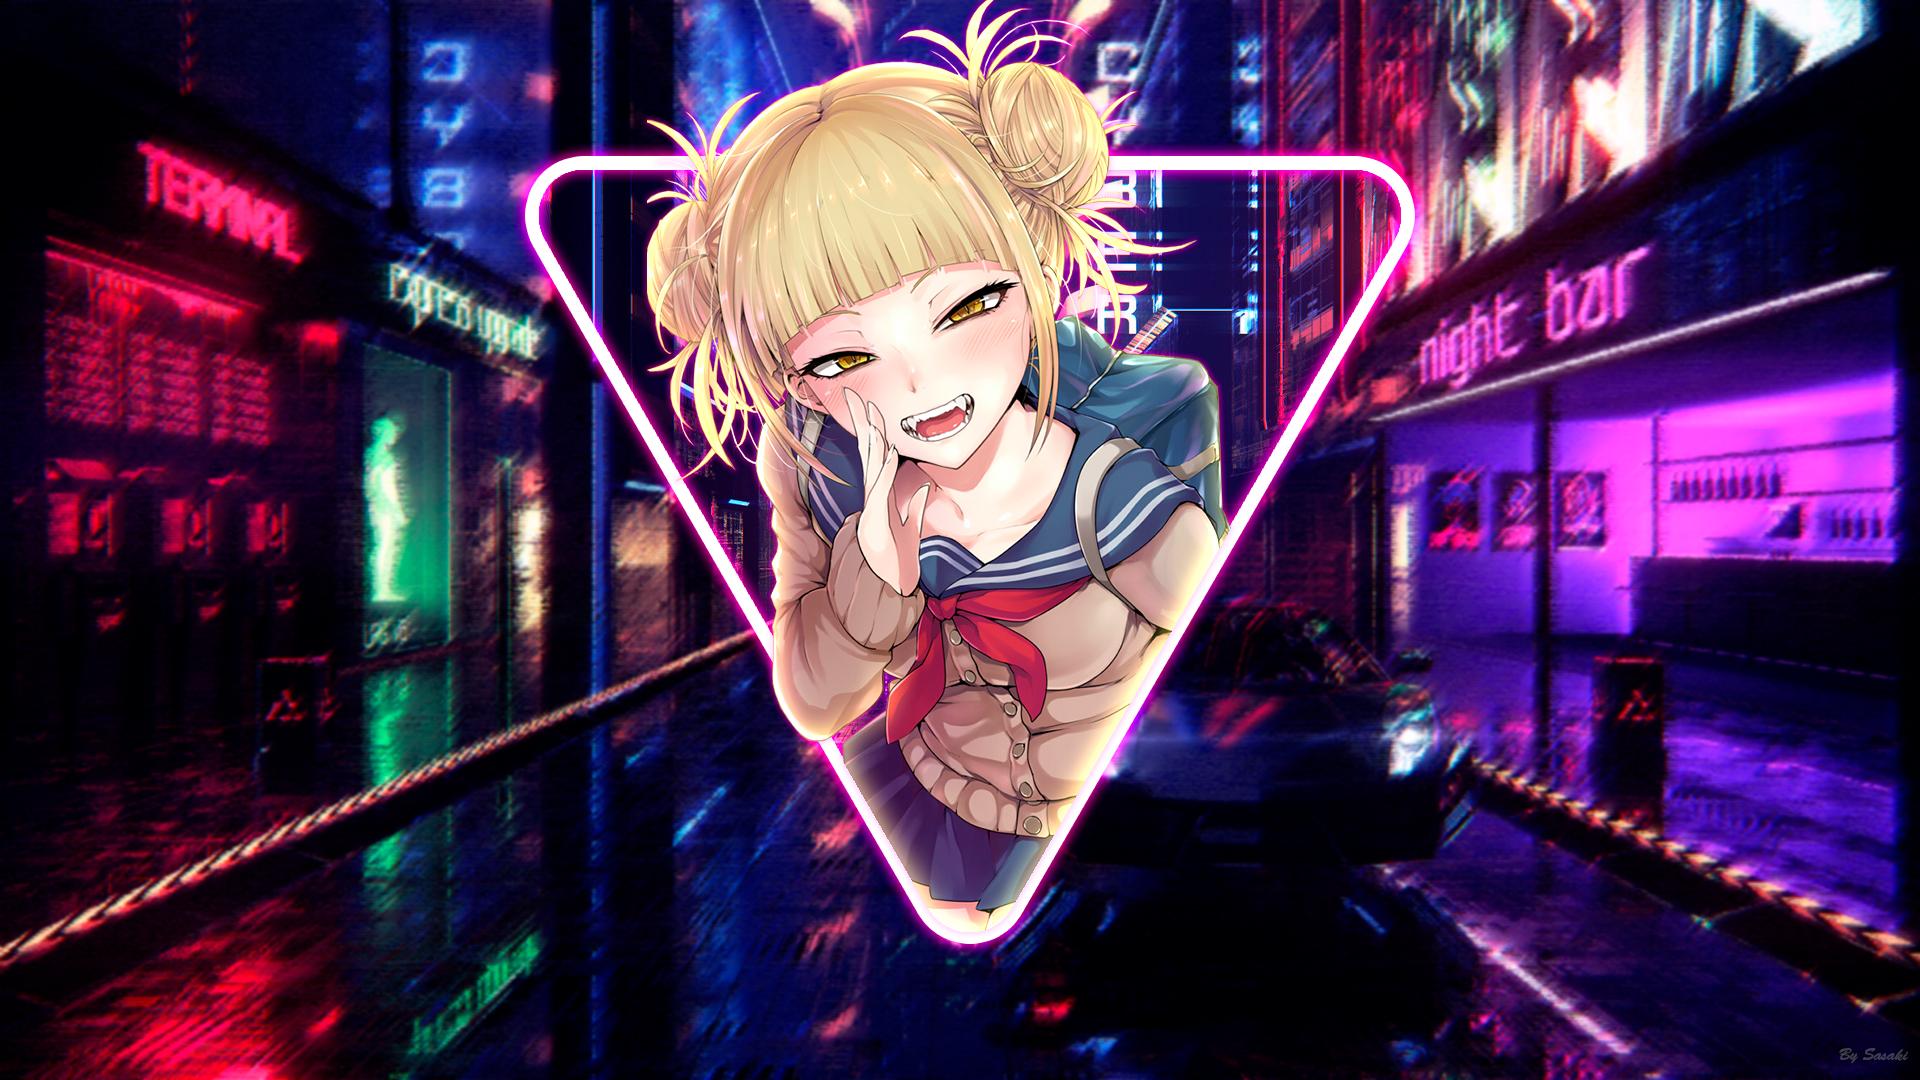 Enjoy boku no hero academia wallpapers in custom new tab themes. Wallpaper : Himiko Toga, anime girls, neon, city, Boku no ...